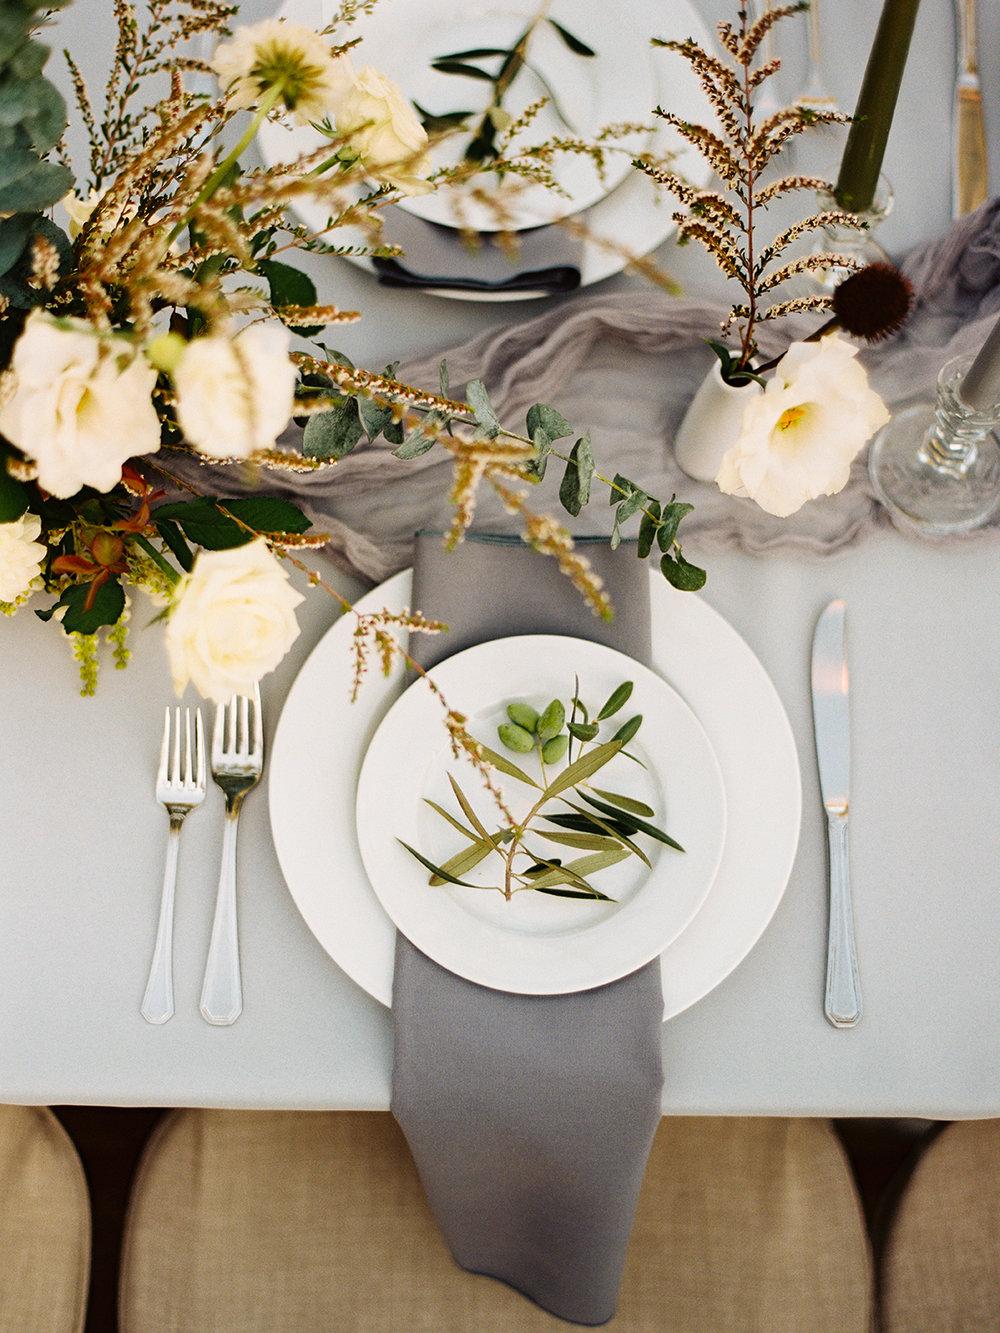 034-brian-sarra-los-angeles-wedding-brumley-wells-photography.jpg